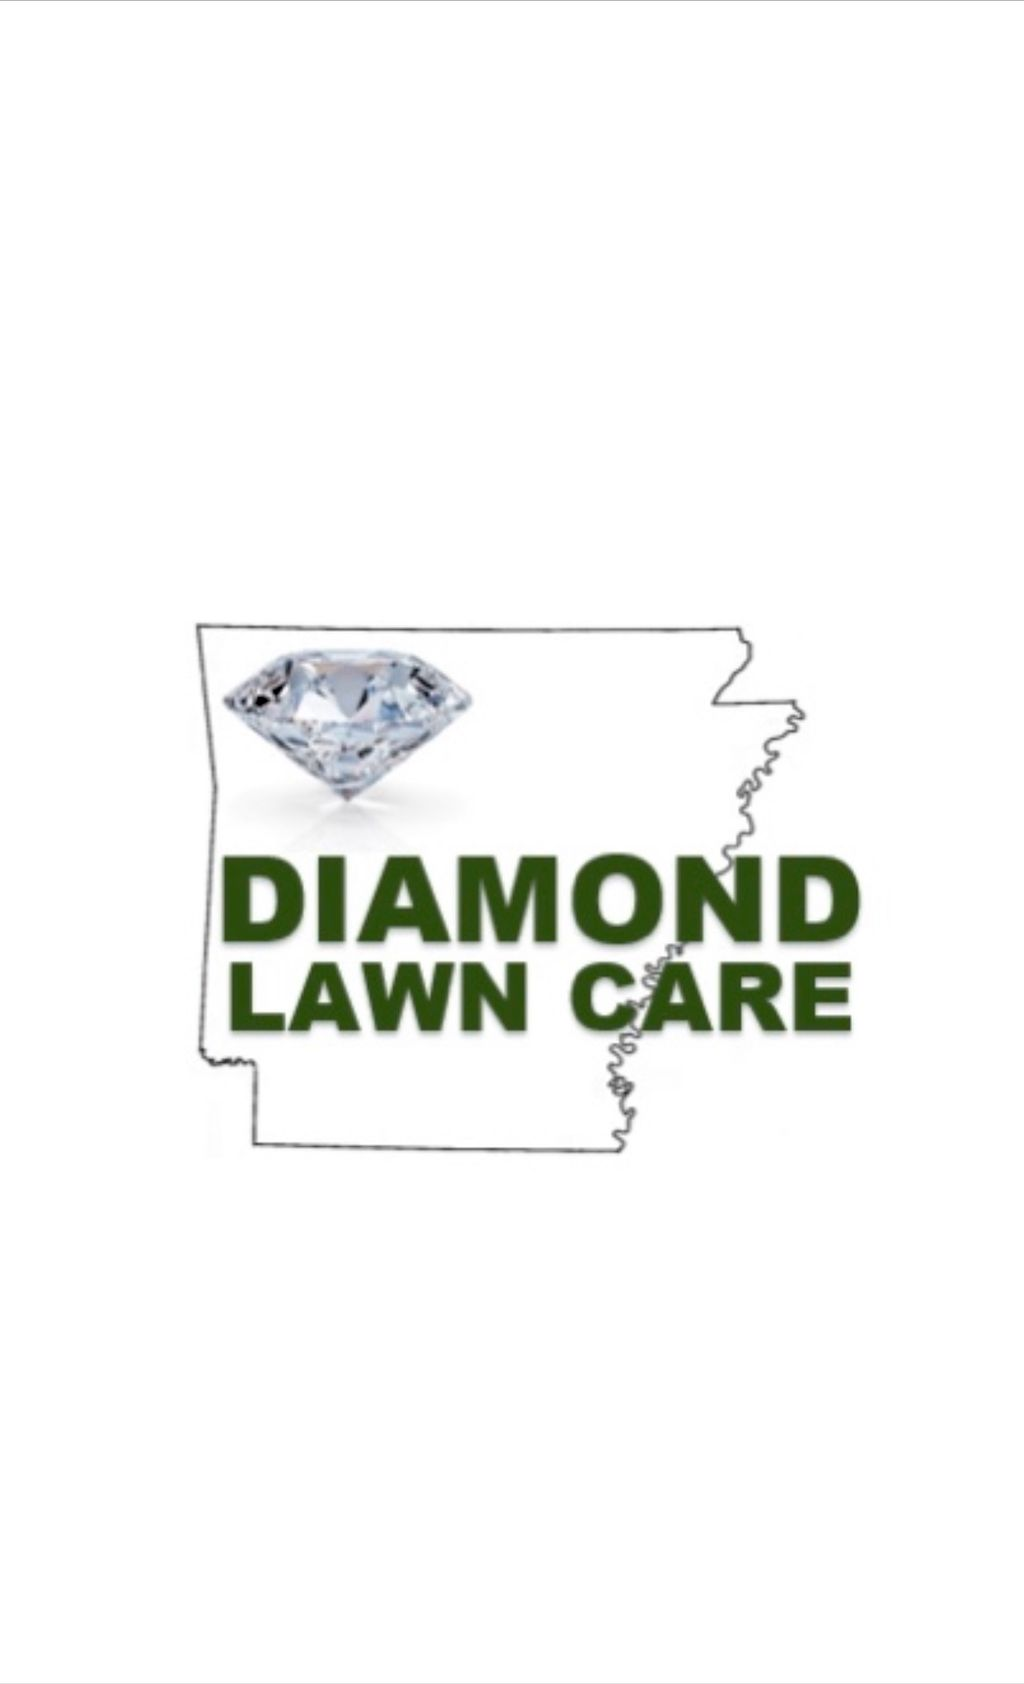 Diamond Lawn Care